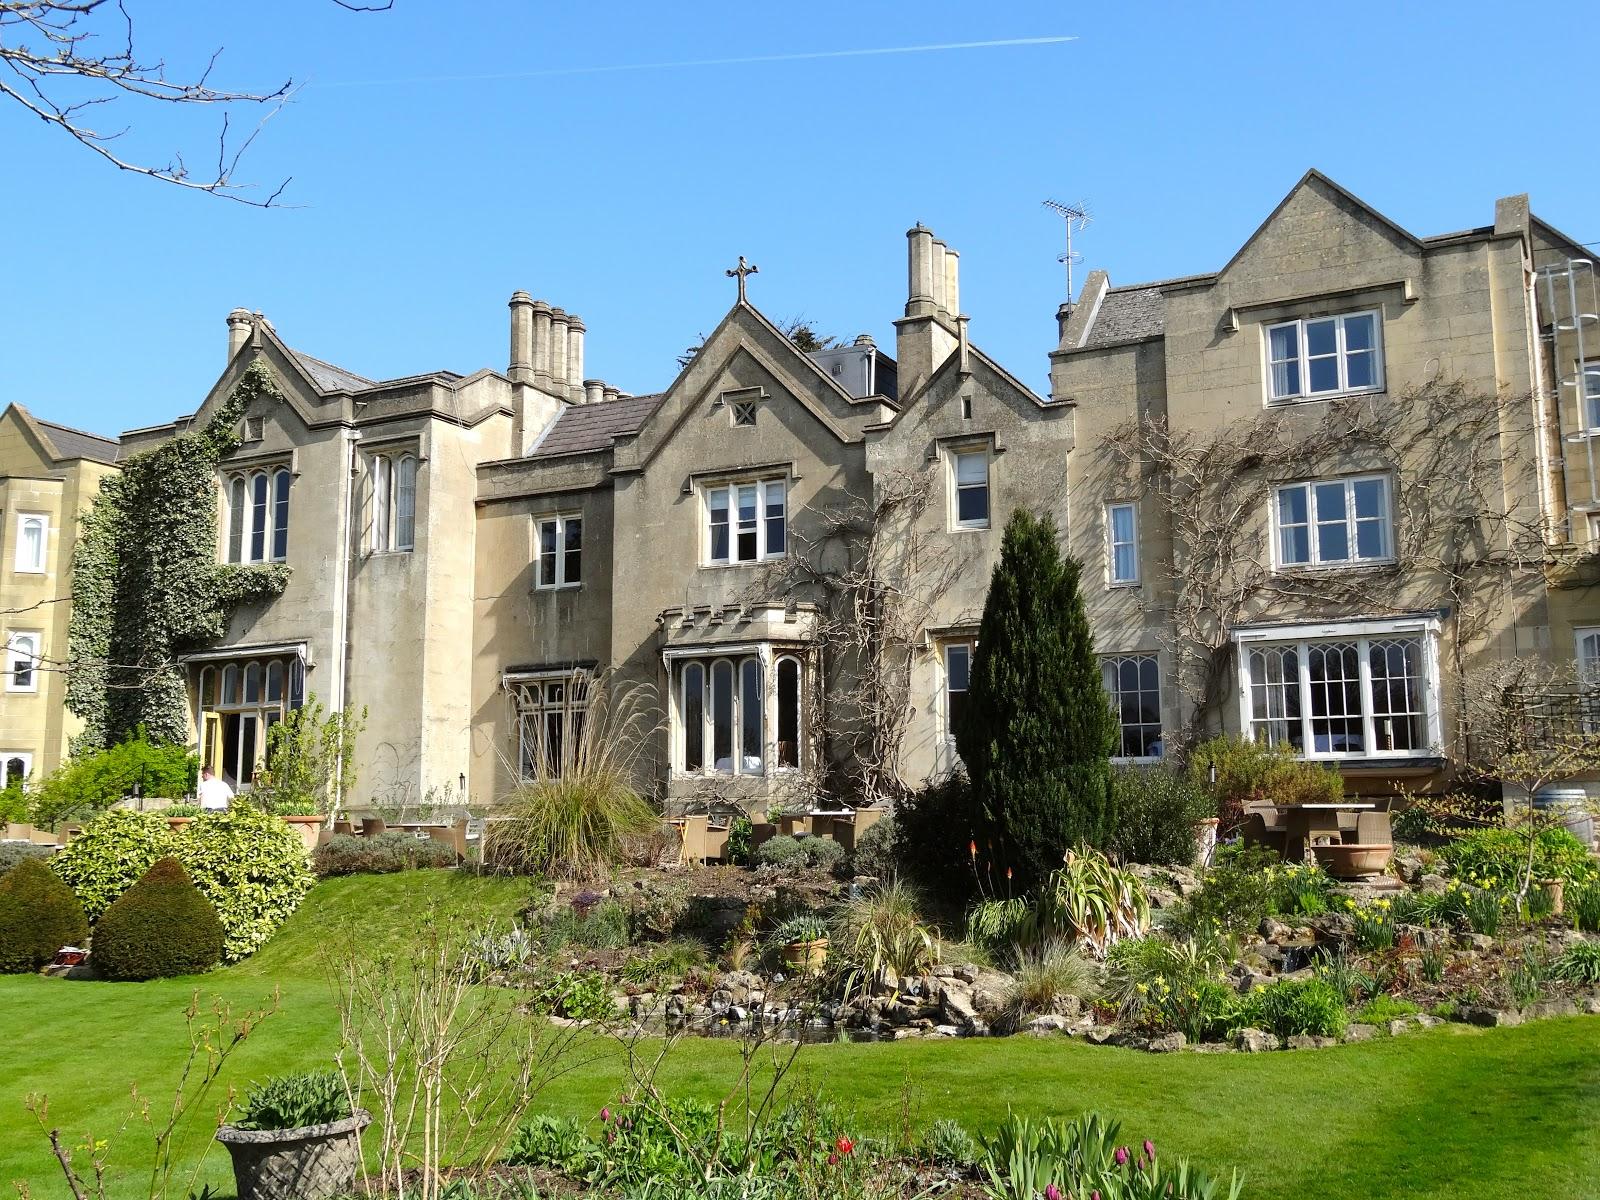 Luxury Spa Hotel en Bath - The Bath Priory - Hotel, Restaurante y Spa